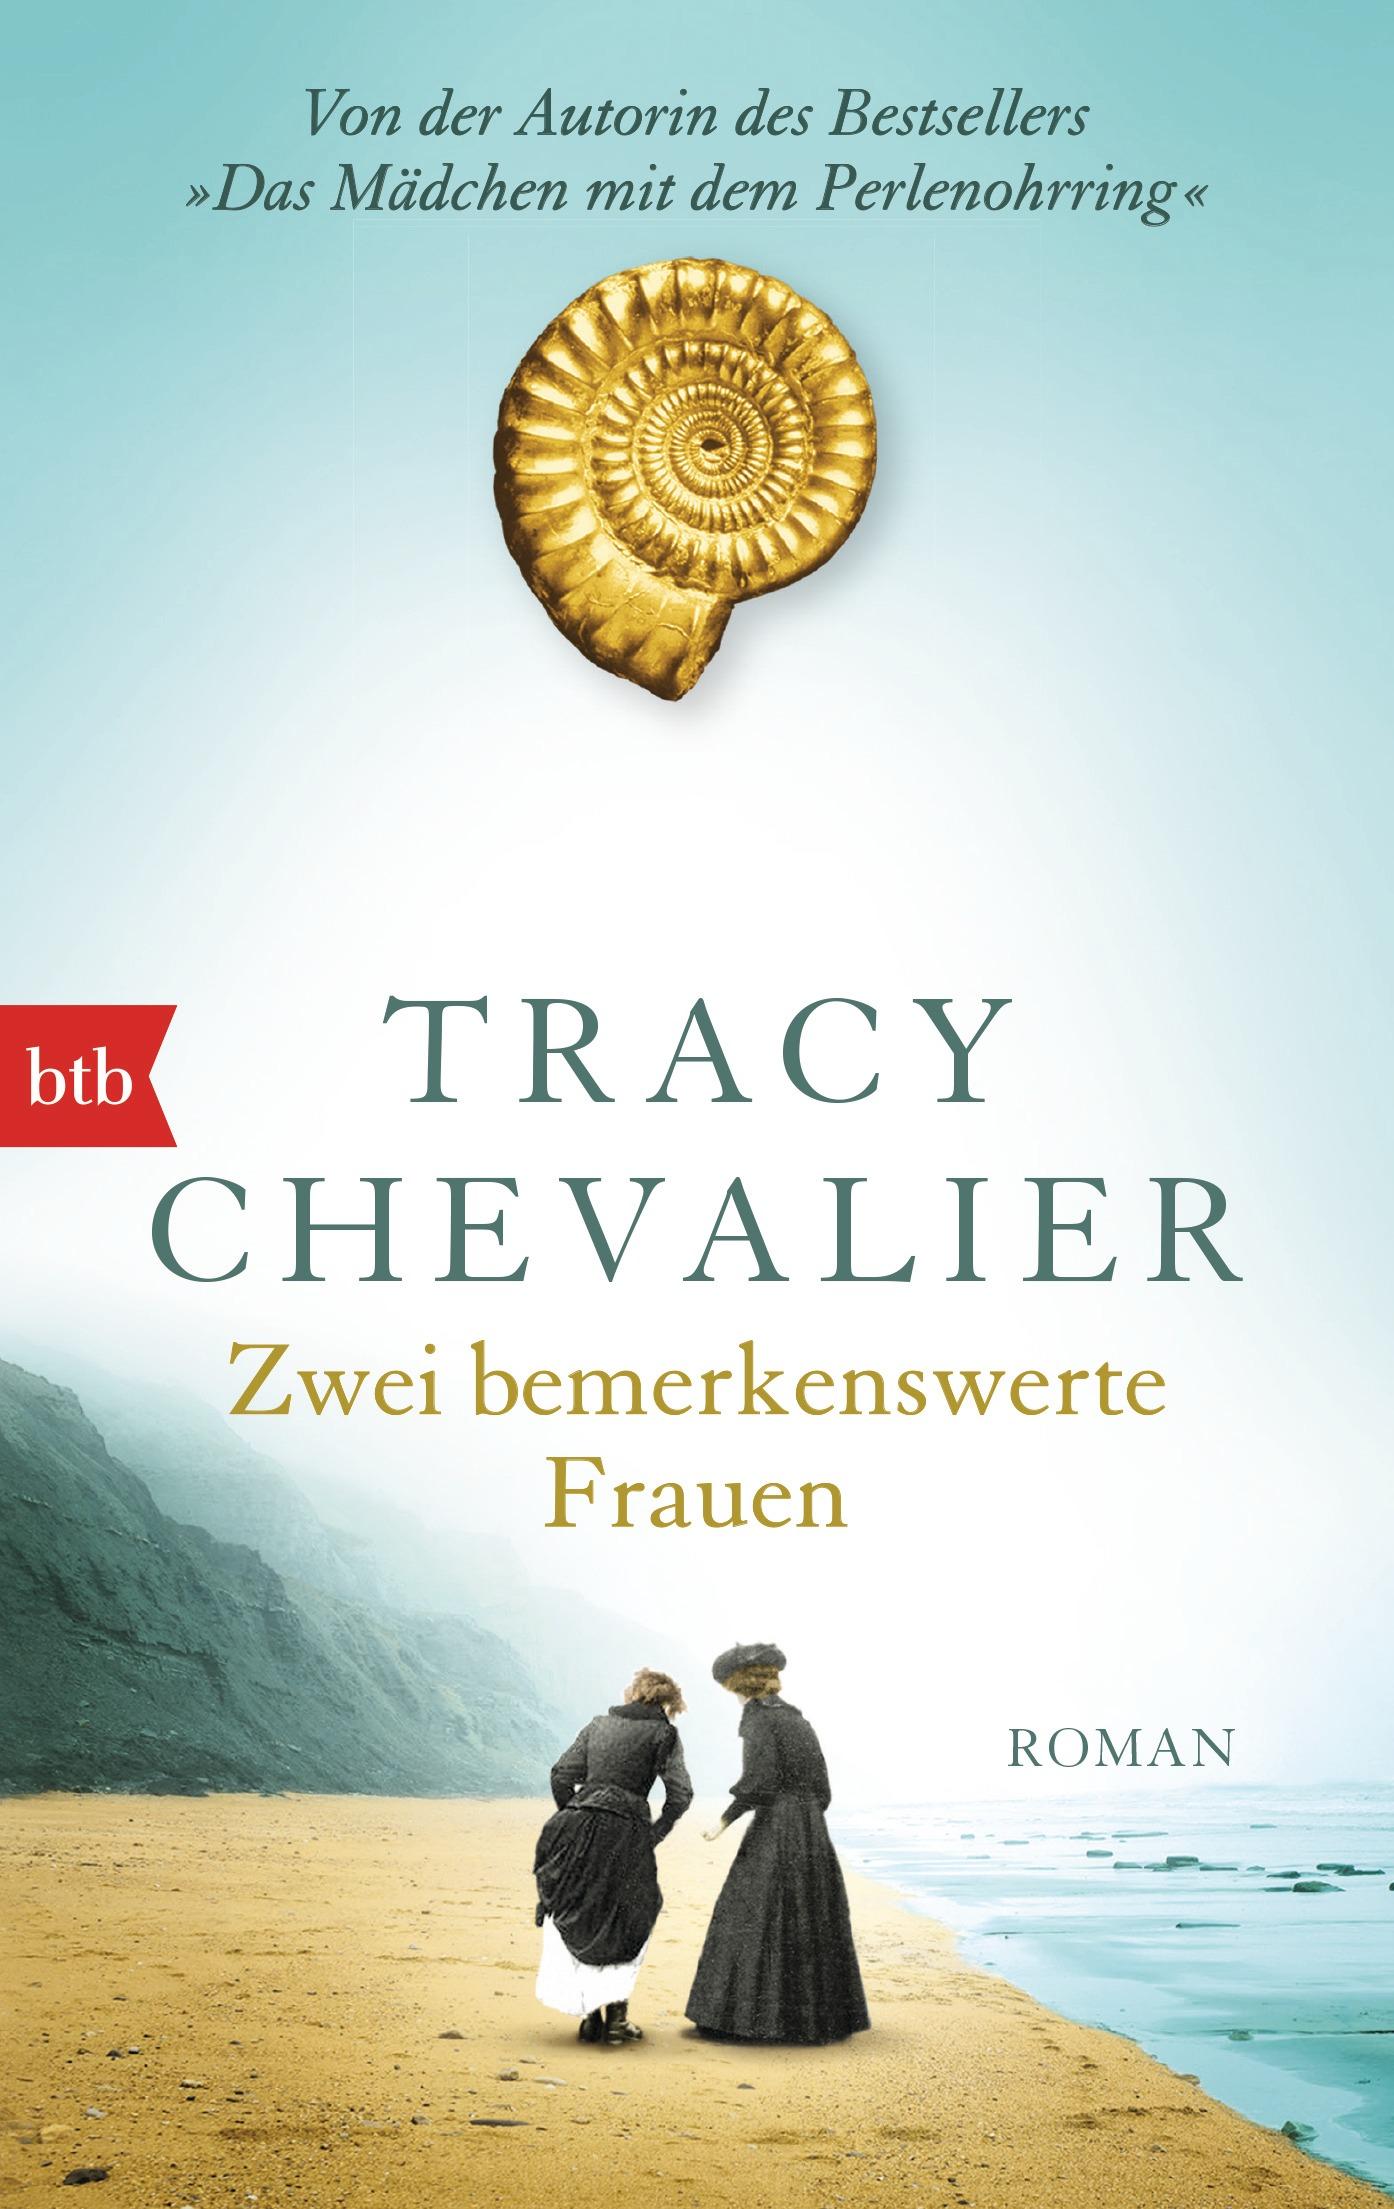 Zwei bemerkenswerte Frauen: Roman - Tracy Chevalier